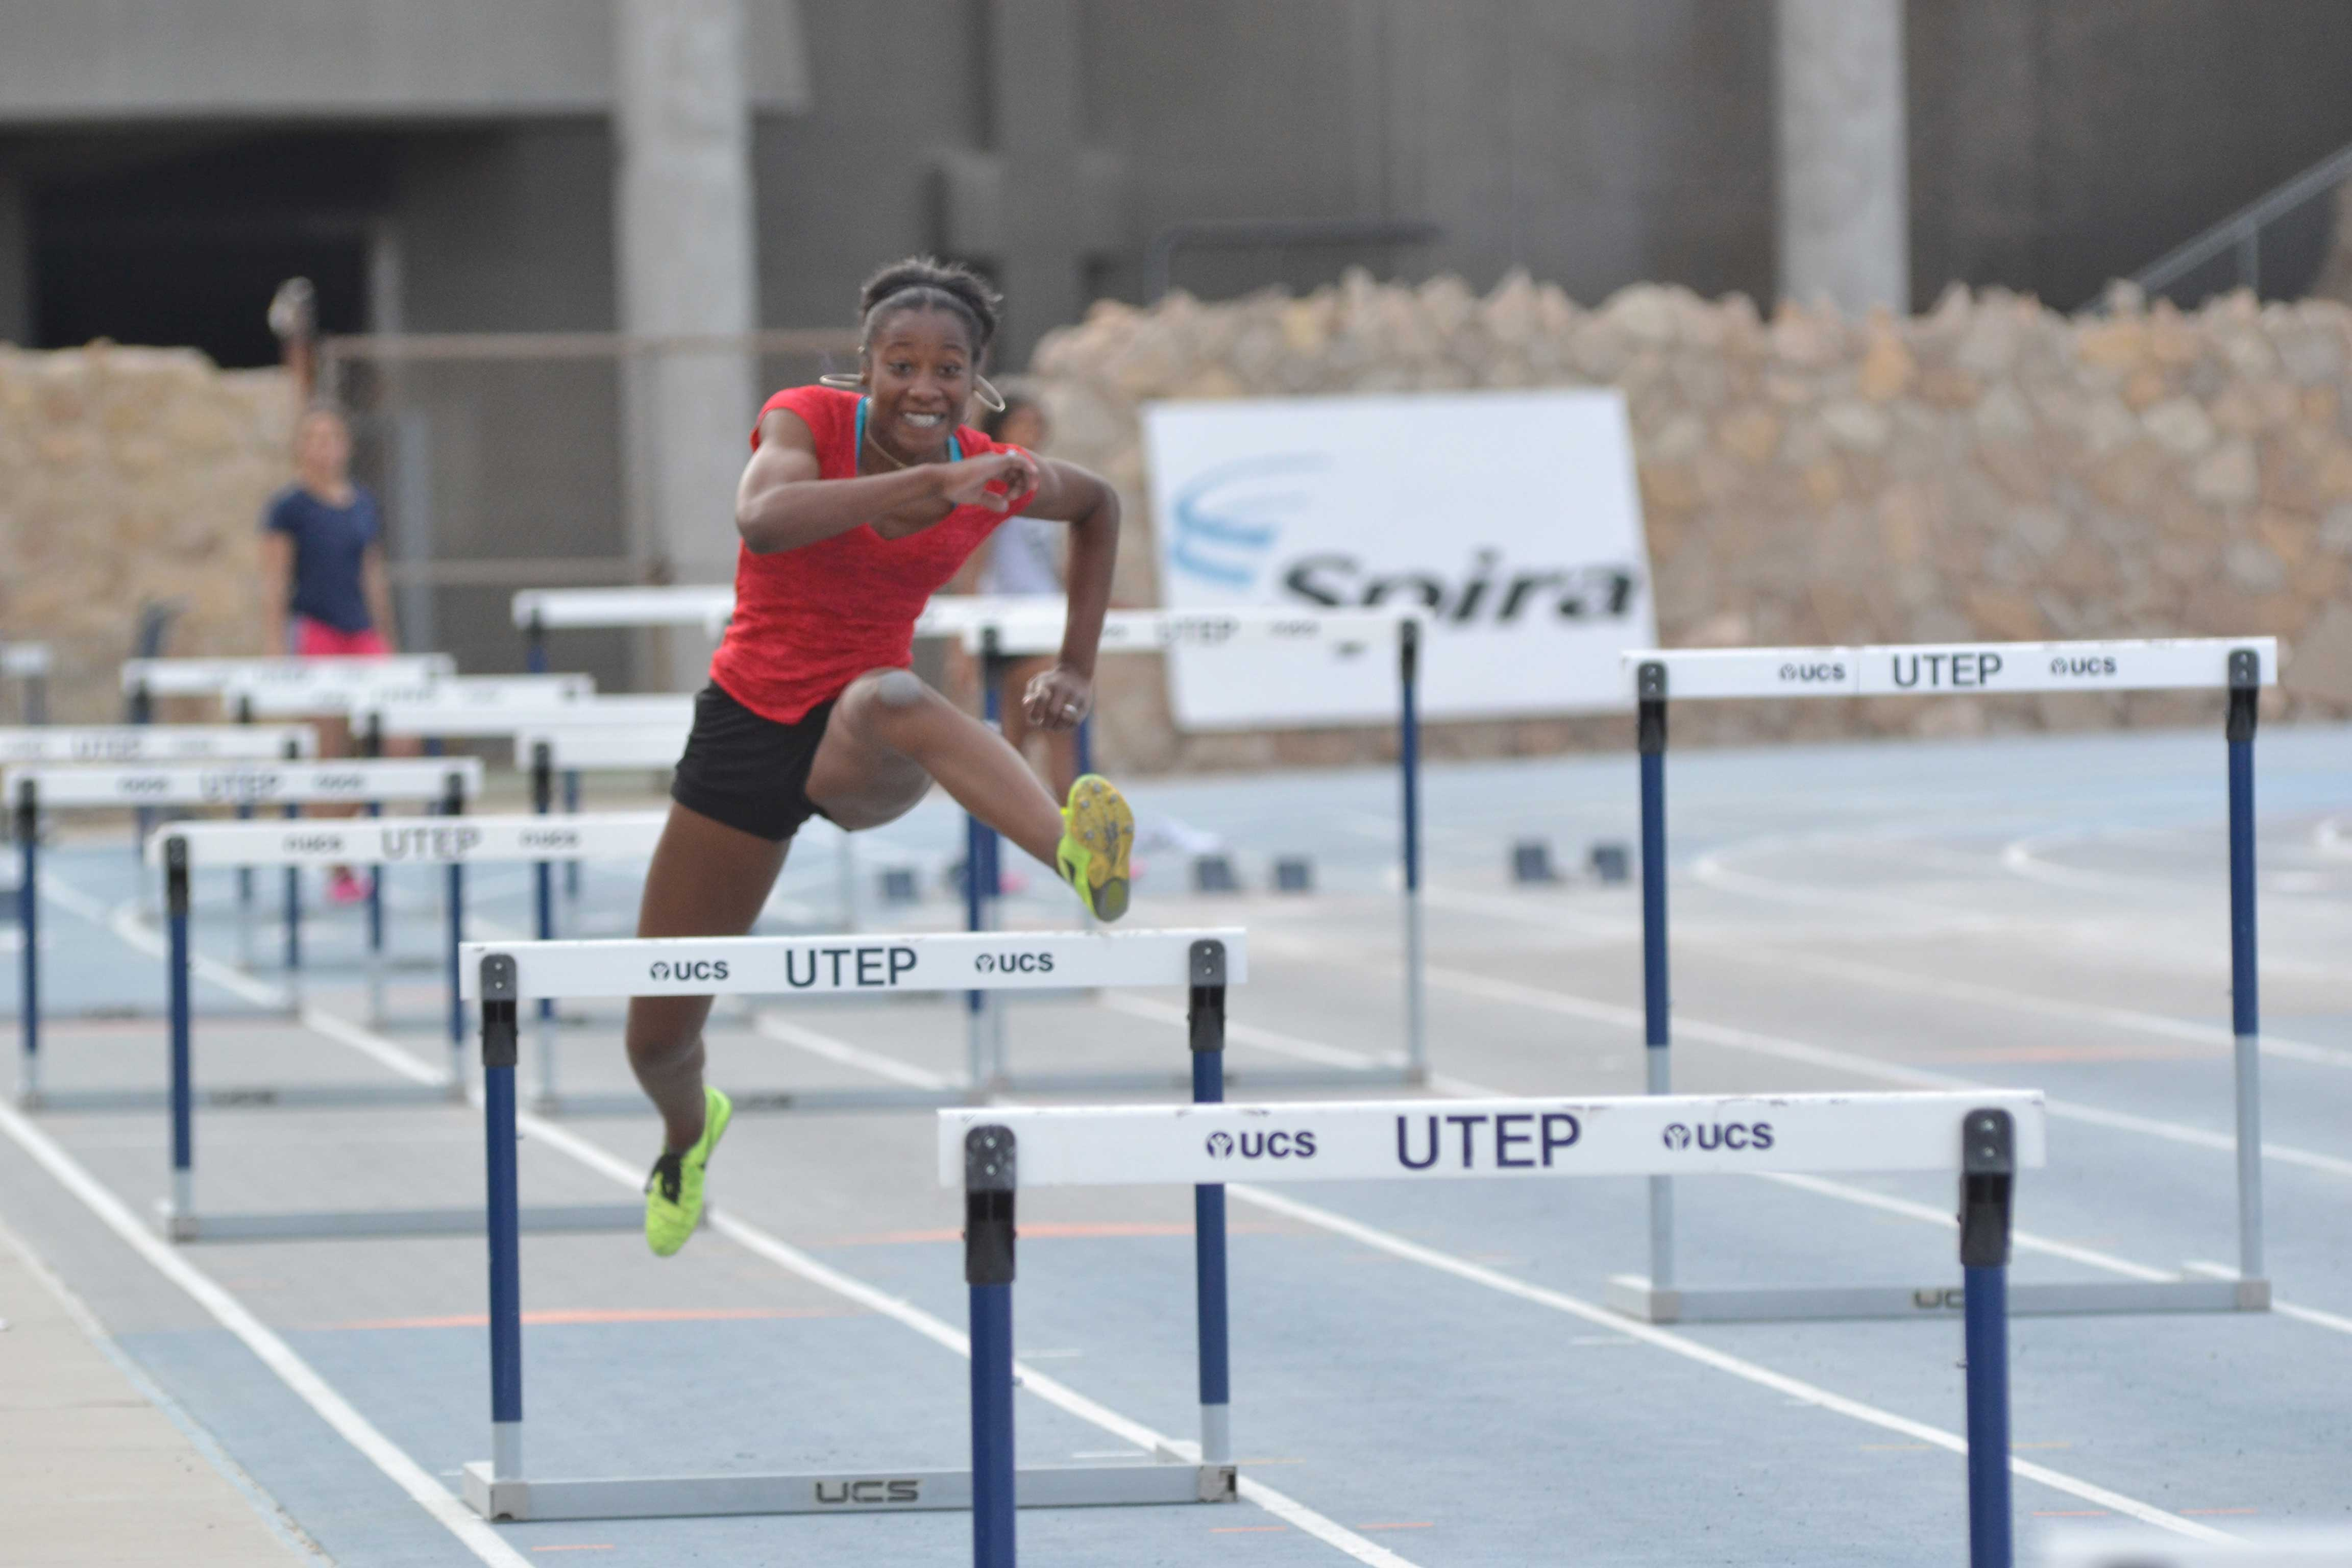 Sophomore hurdler/jumper Bria Love practices the 60-meter dash with hurdles at Kidd Field.